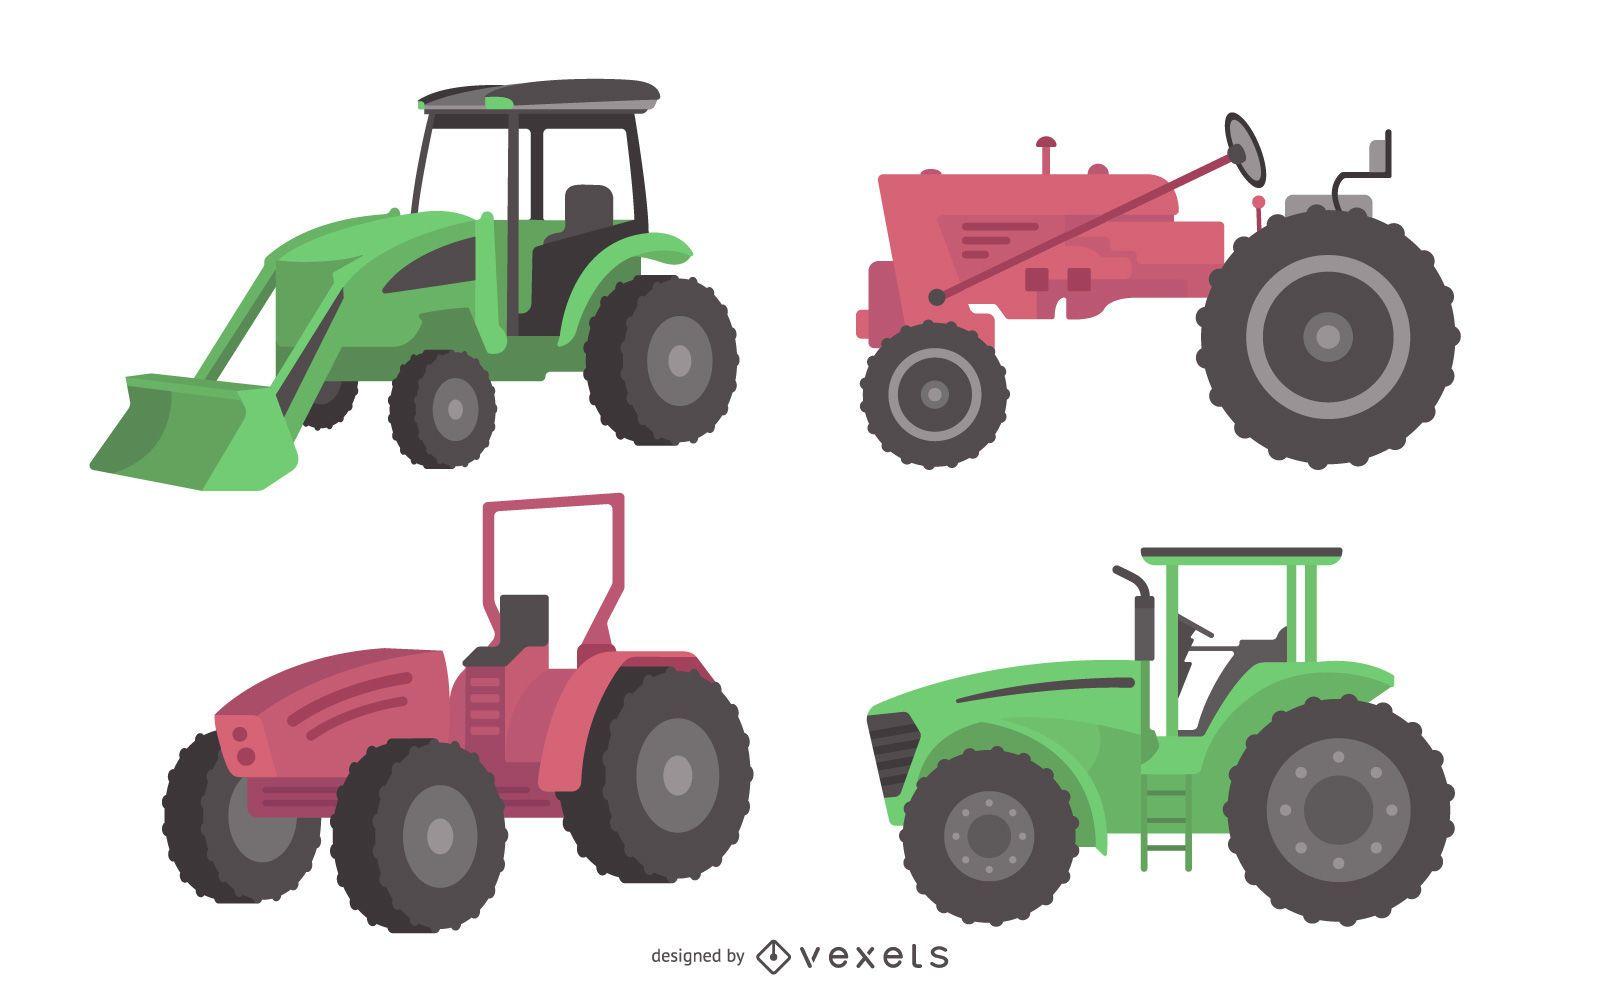 Flat Design Farm Tractor Illustration Set